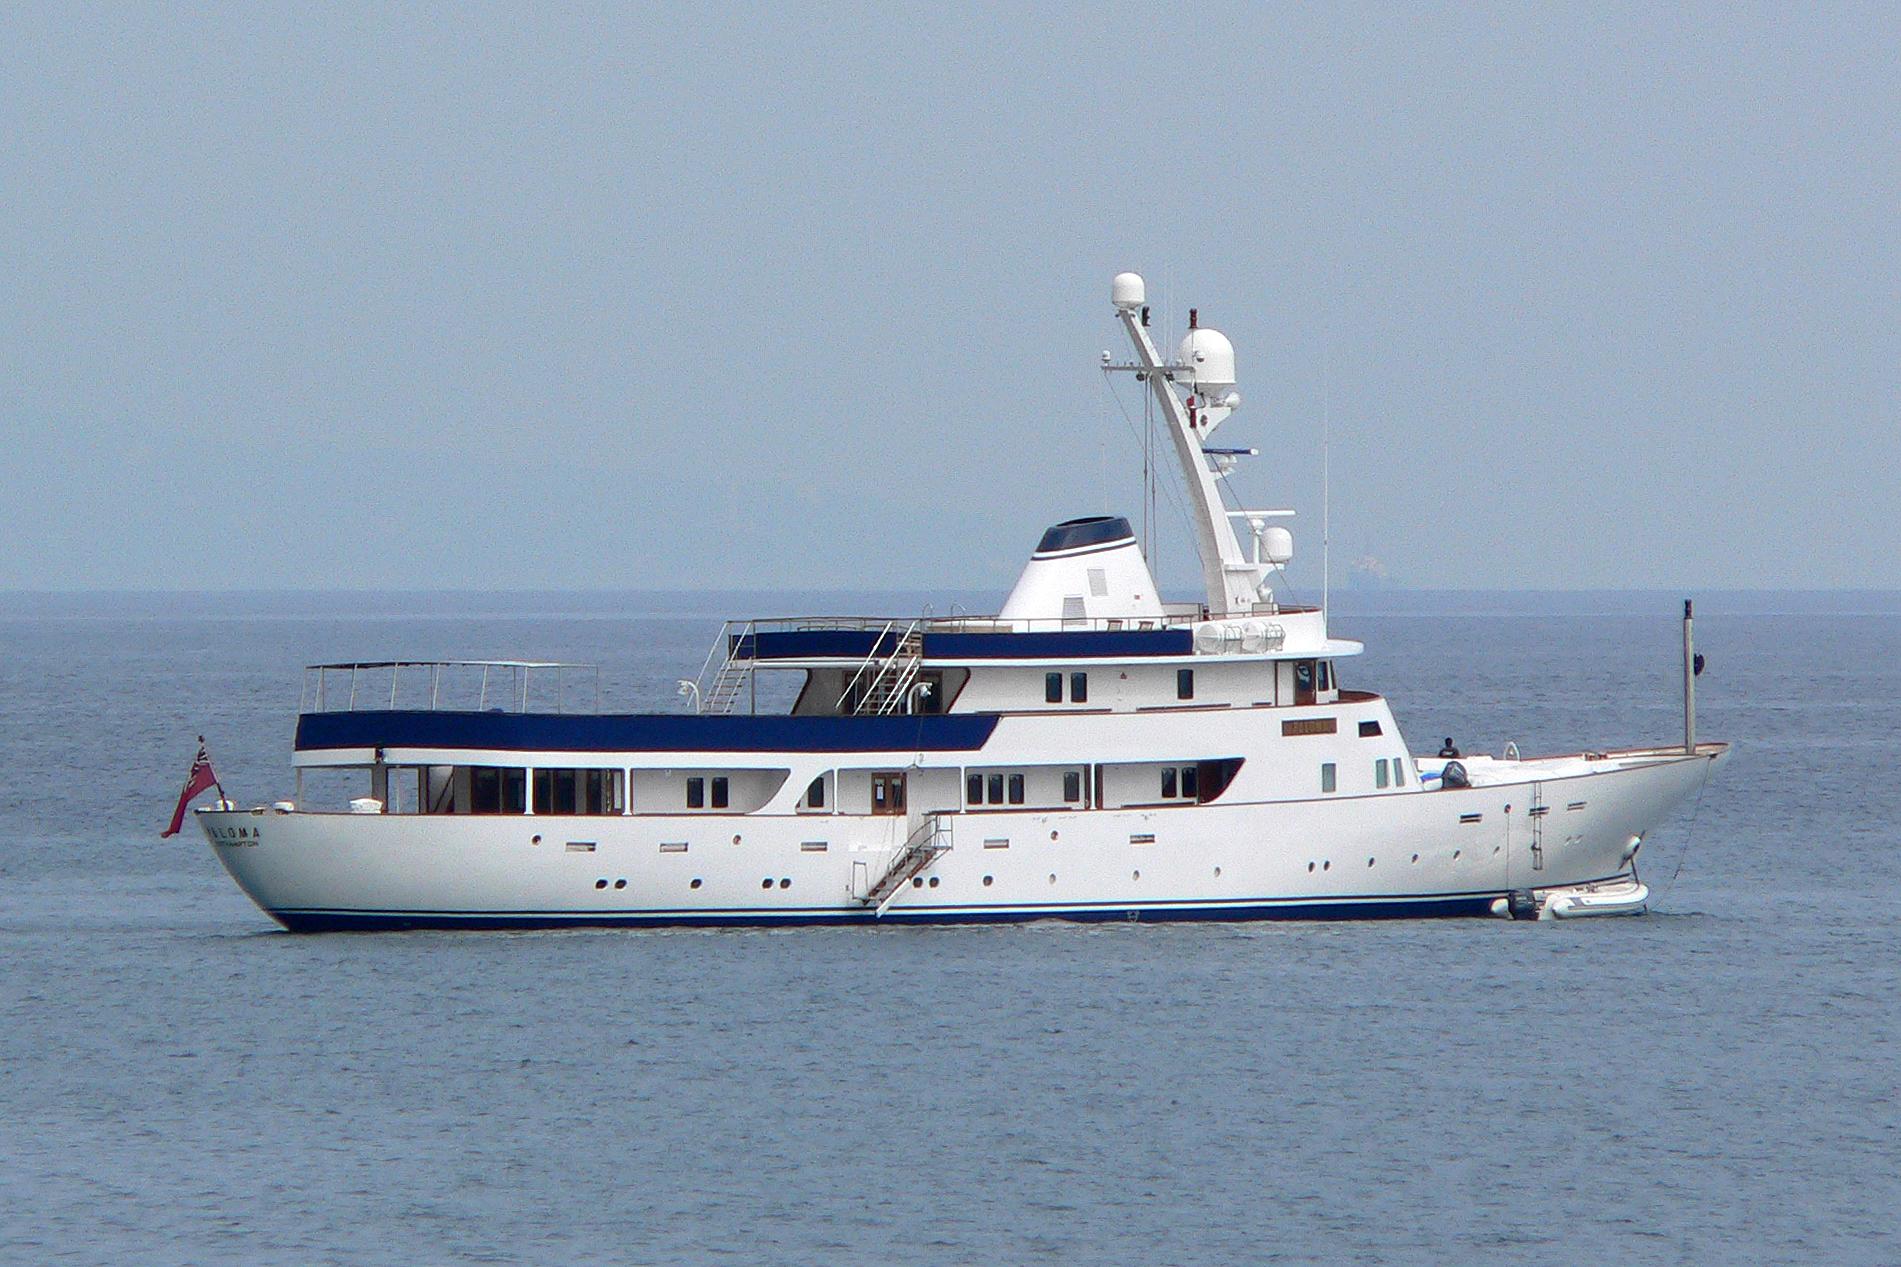 Beluga C Luxury Motor Yacht pre-refit. Post-refit photos to be uploaded.